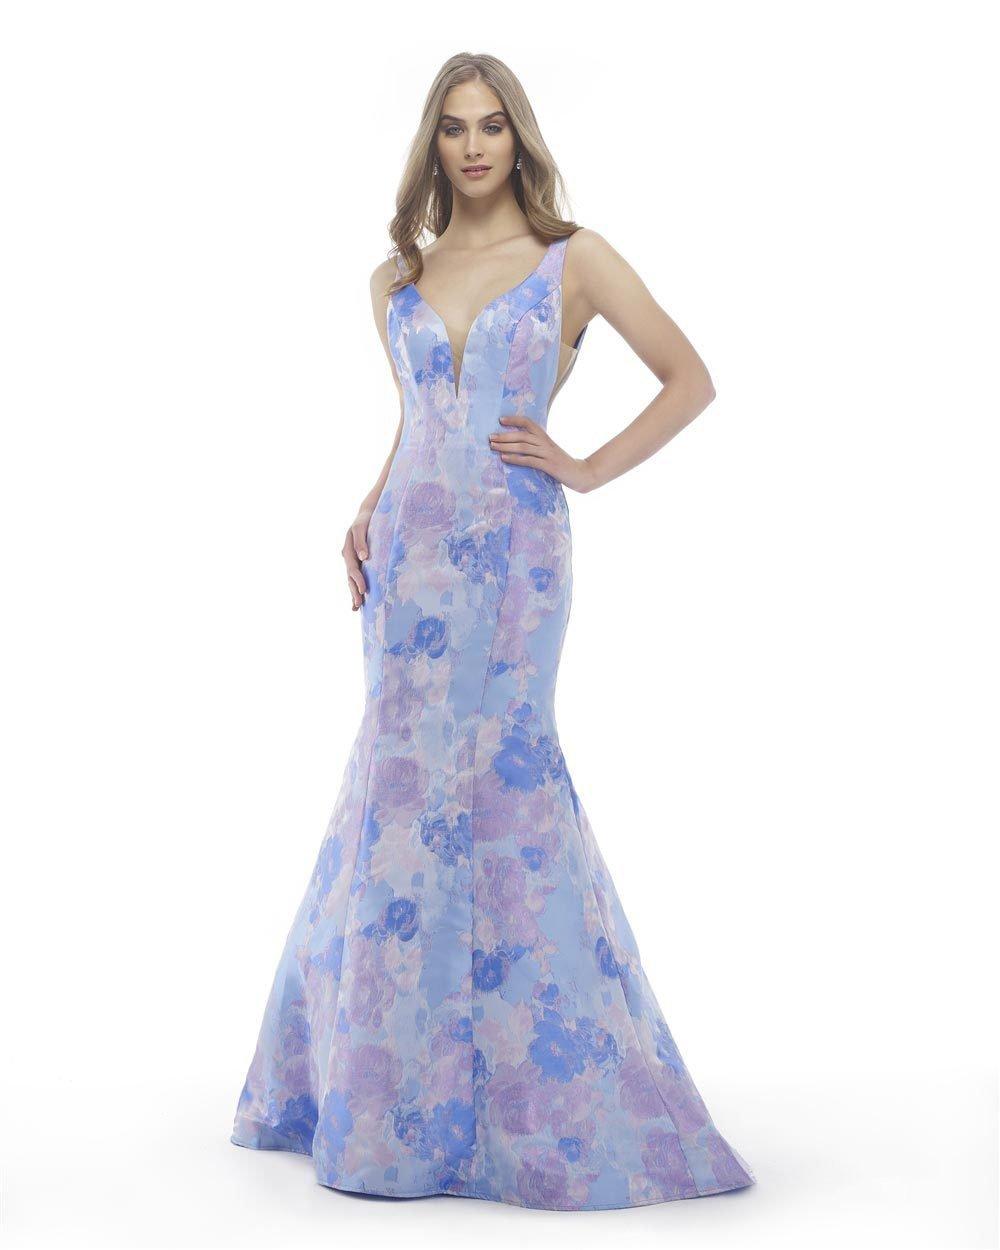 Morrell Maxie - 15811 Jacquard Print Mermaid Dress